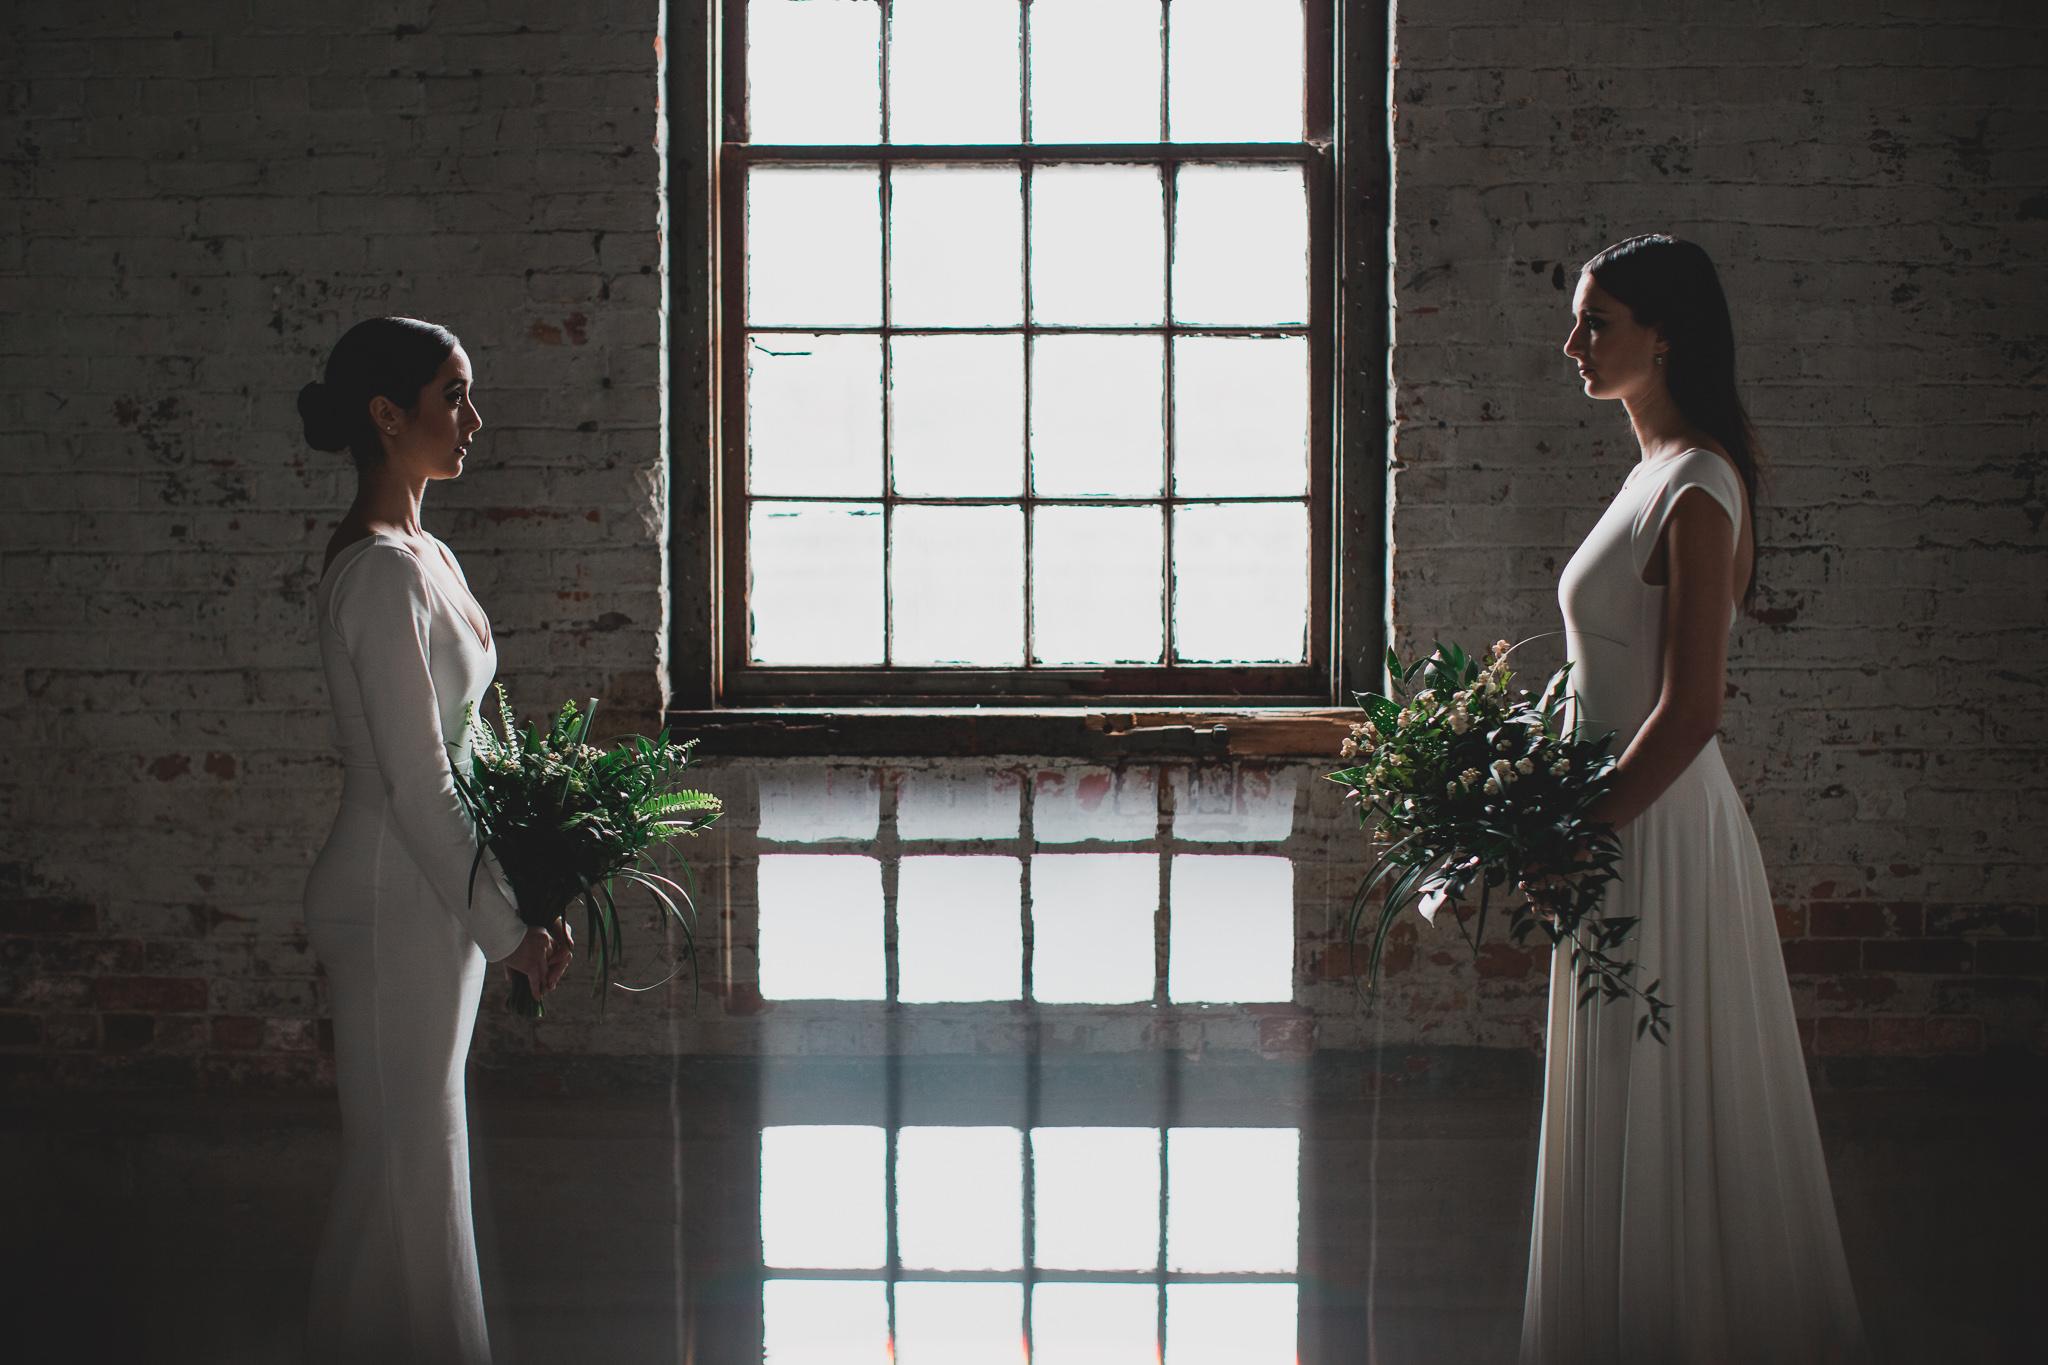 Creative, artsy wedding photographs in Ottawa and Eastern Ontario